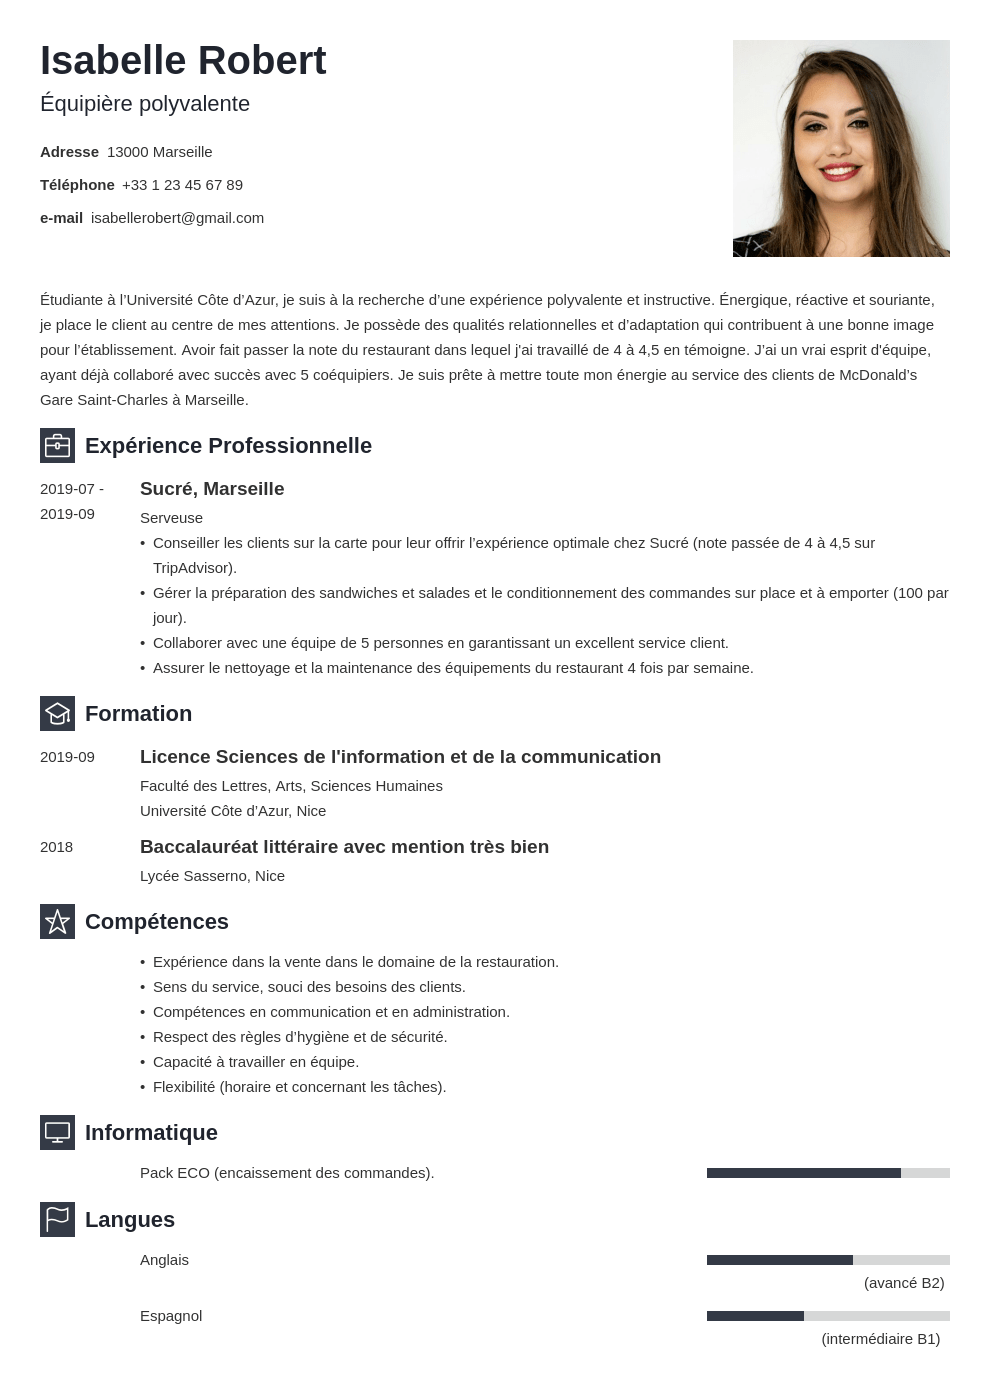 Cv Mcdo Exemple De Cv Pour Recrutement Chez Mcdonald S